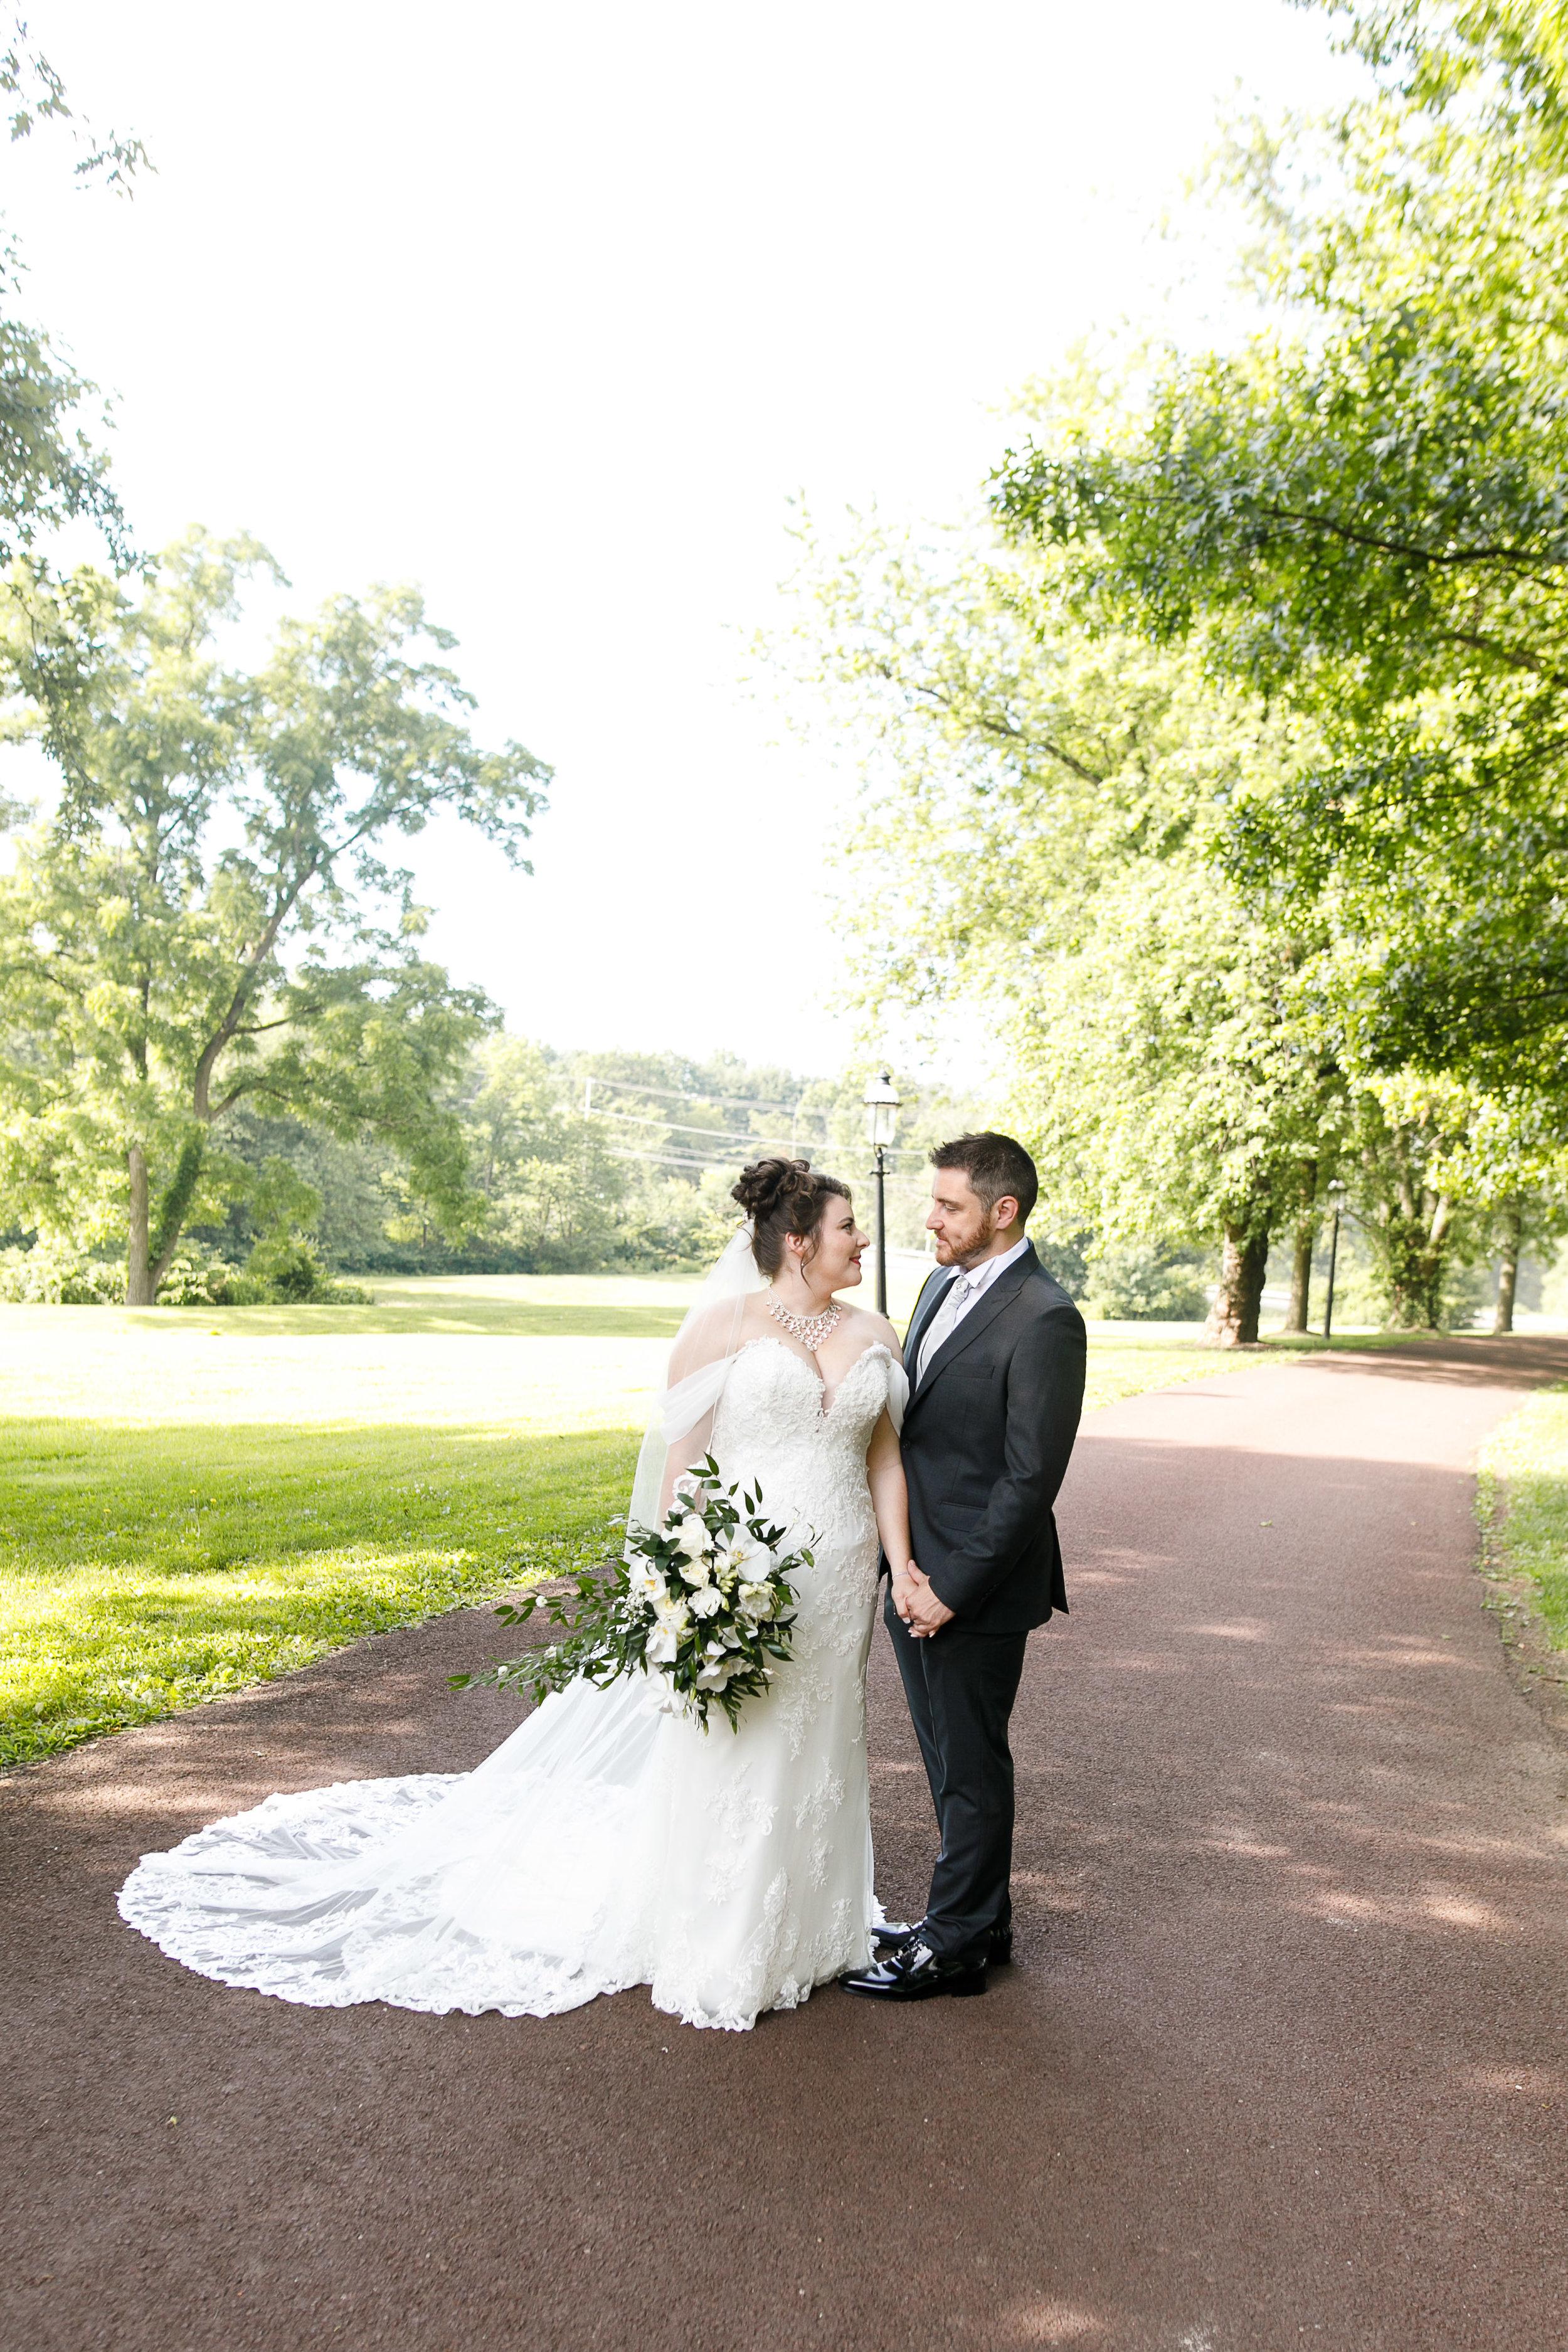 Wedding at Joseph Ambler In Bucks County PA5.jpg